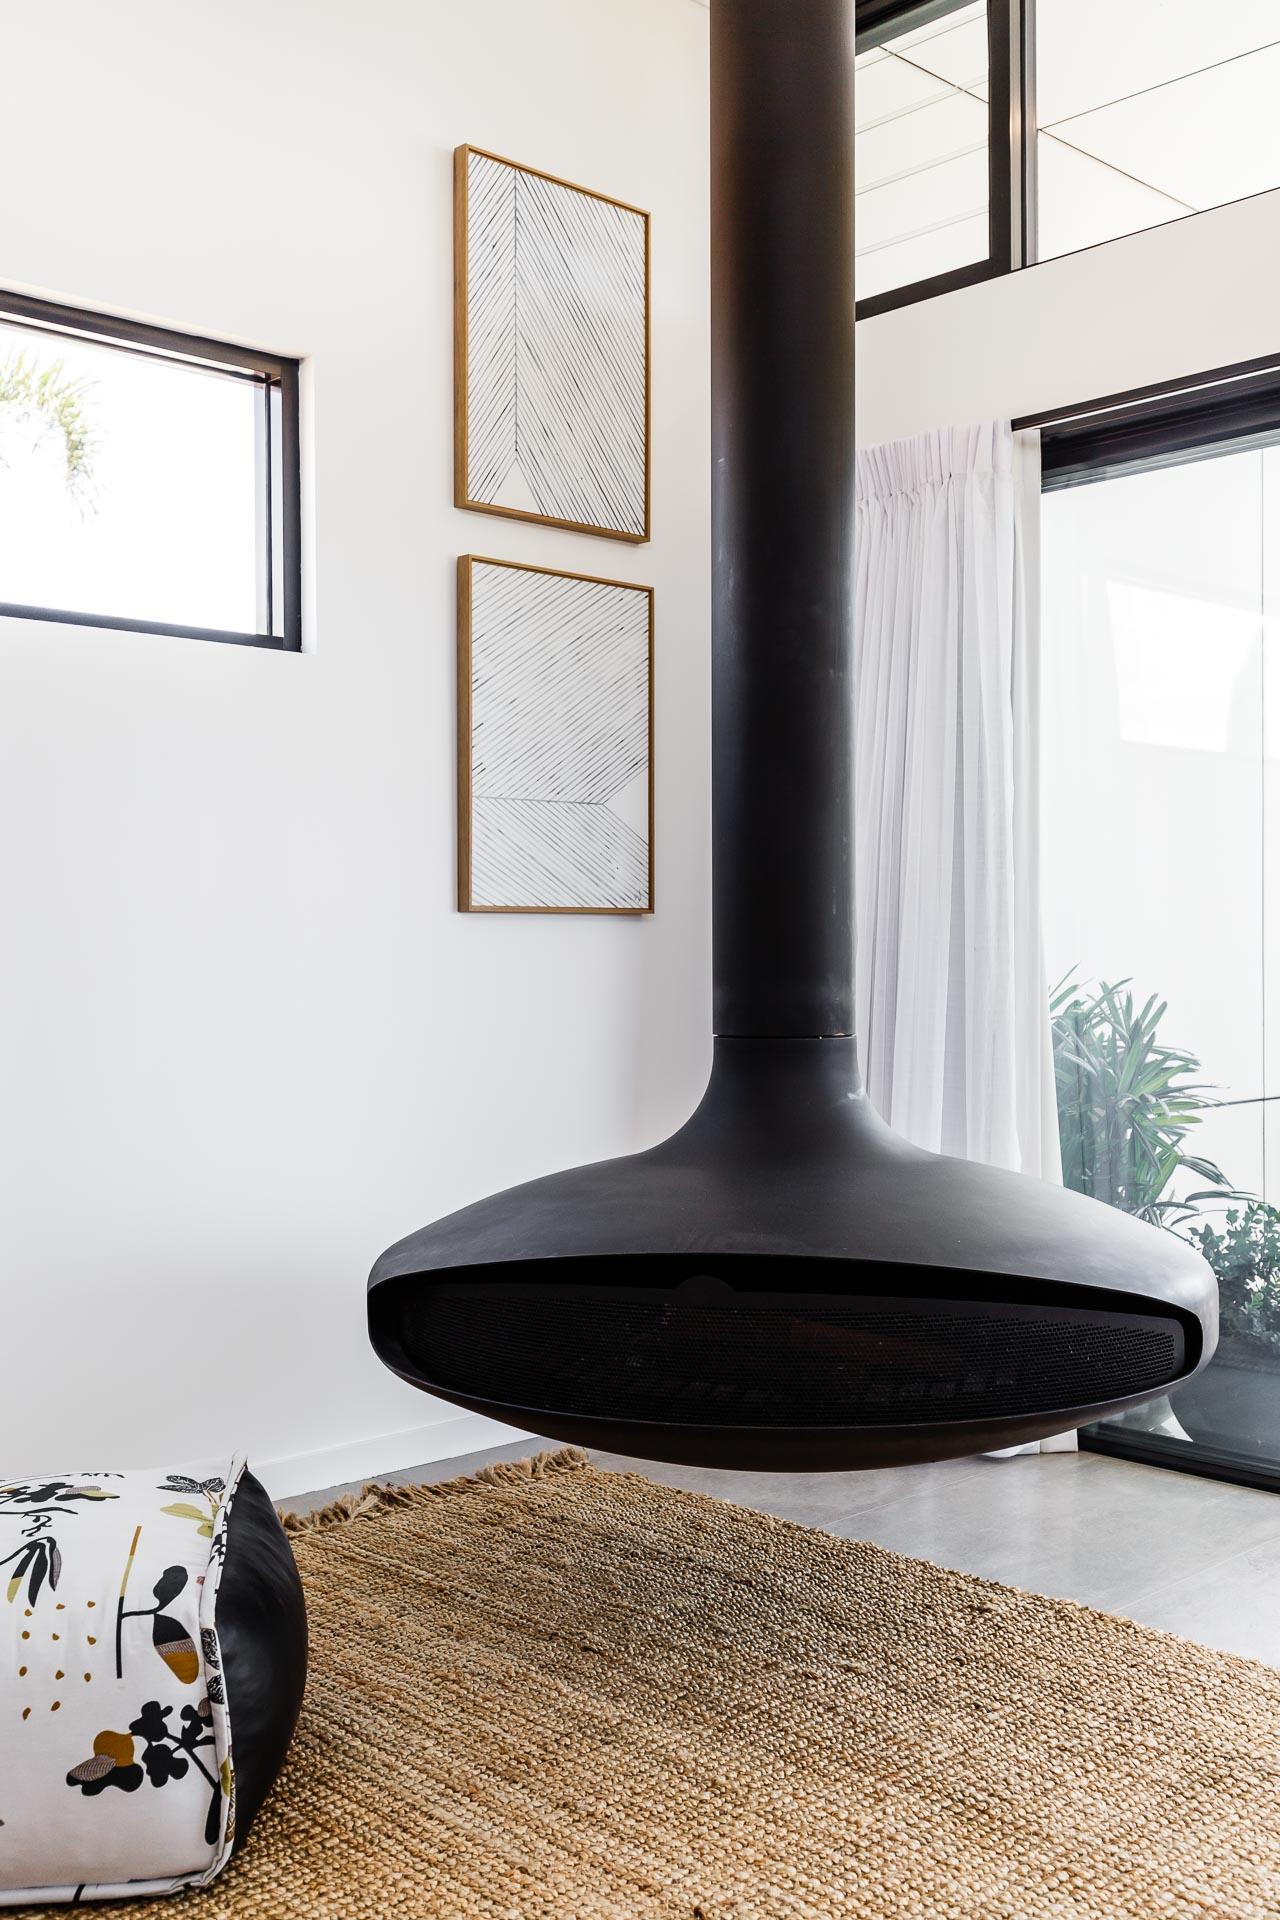 WEB - Architectural Photography Sydney - Open House Perth 2017 - Sebastian Photography 16.jpg